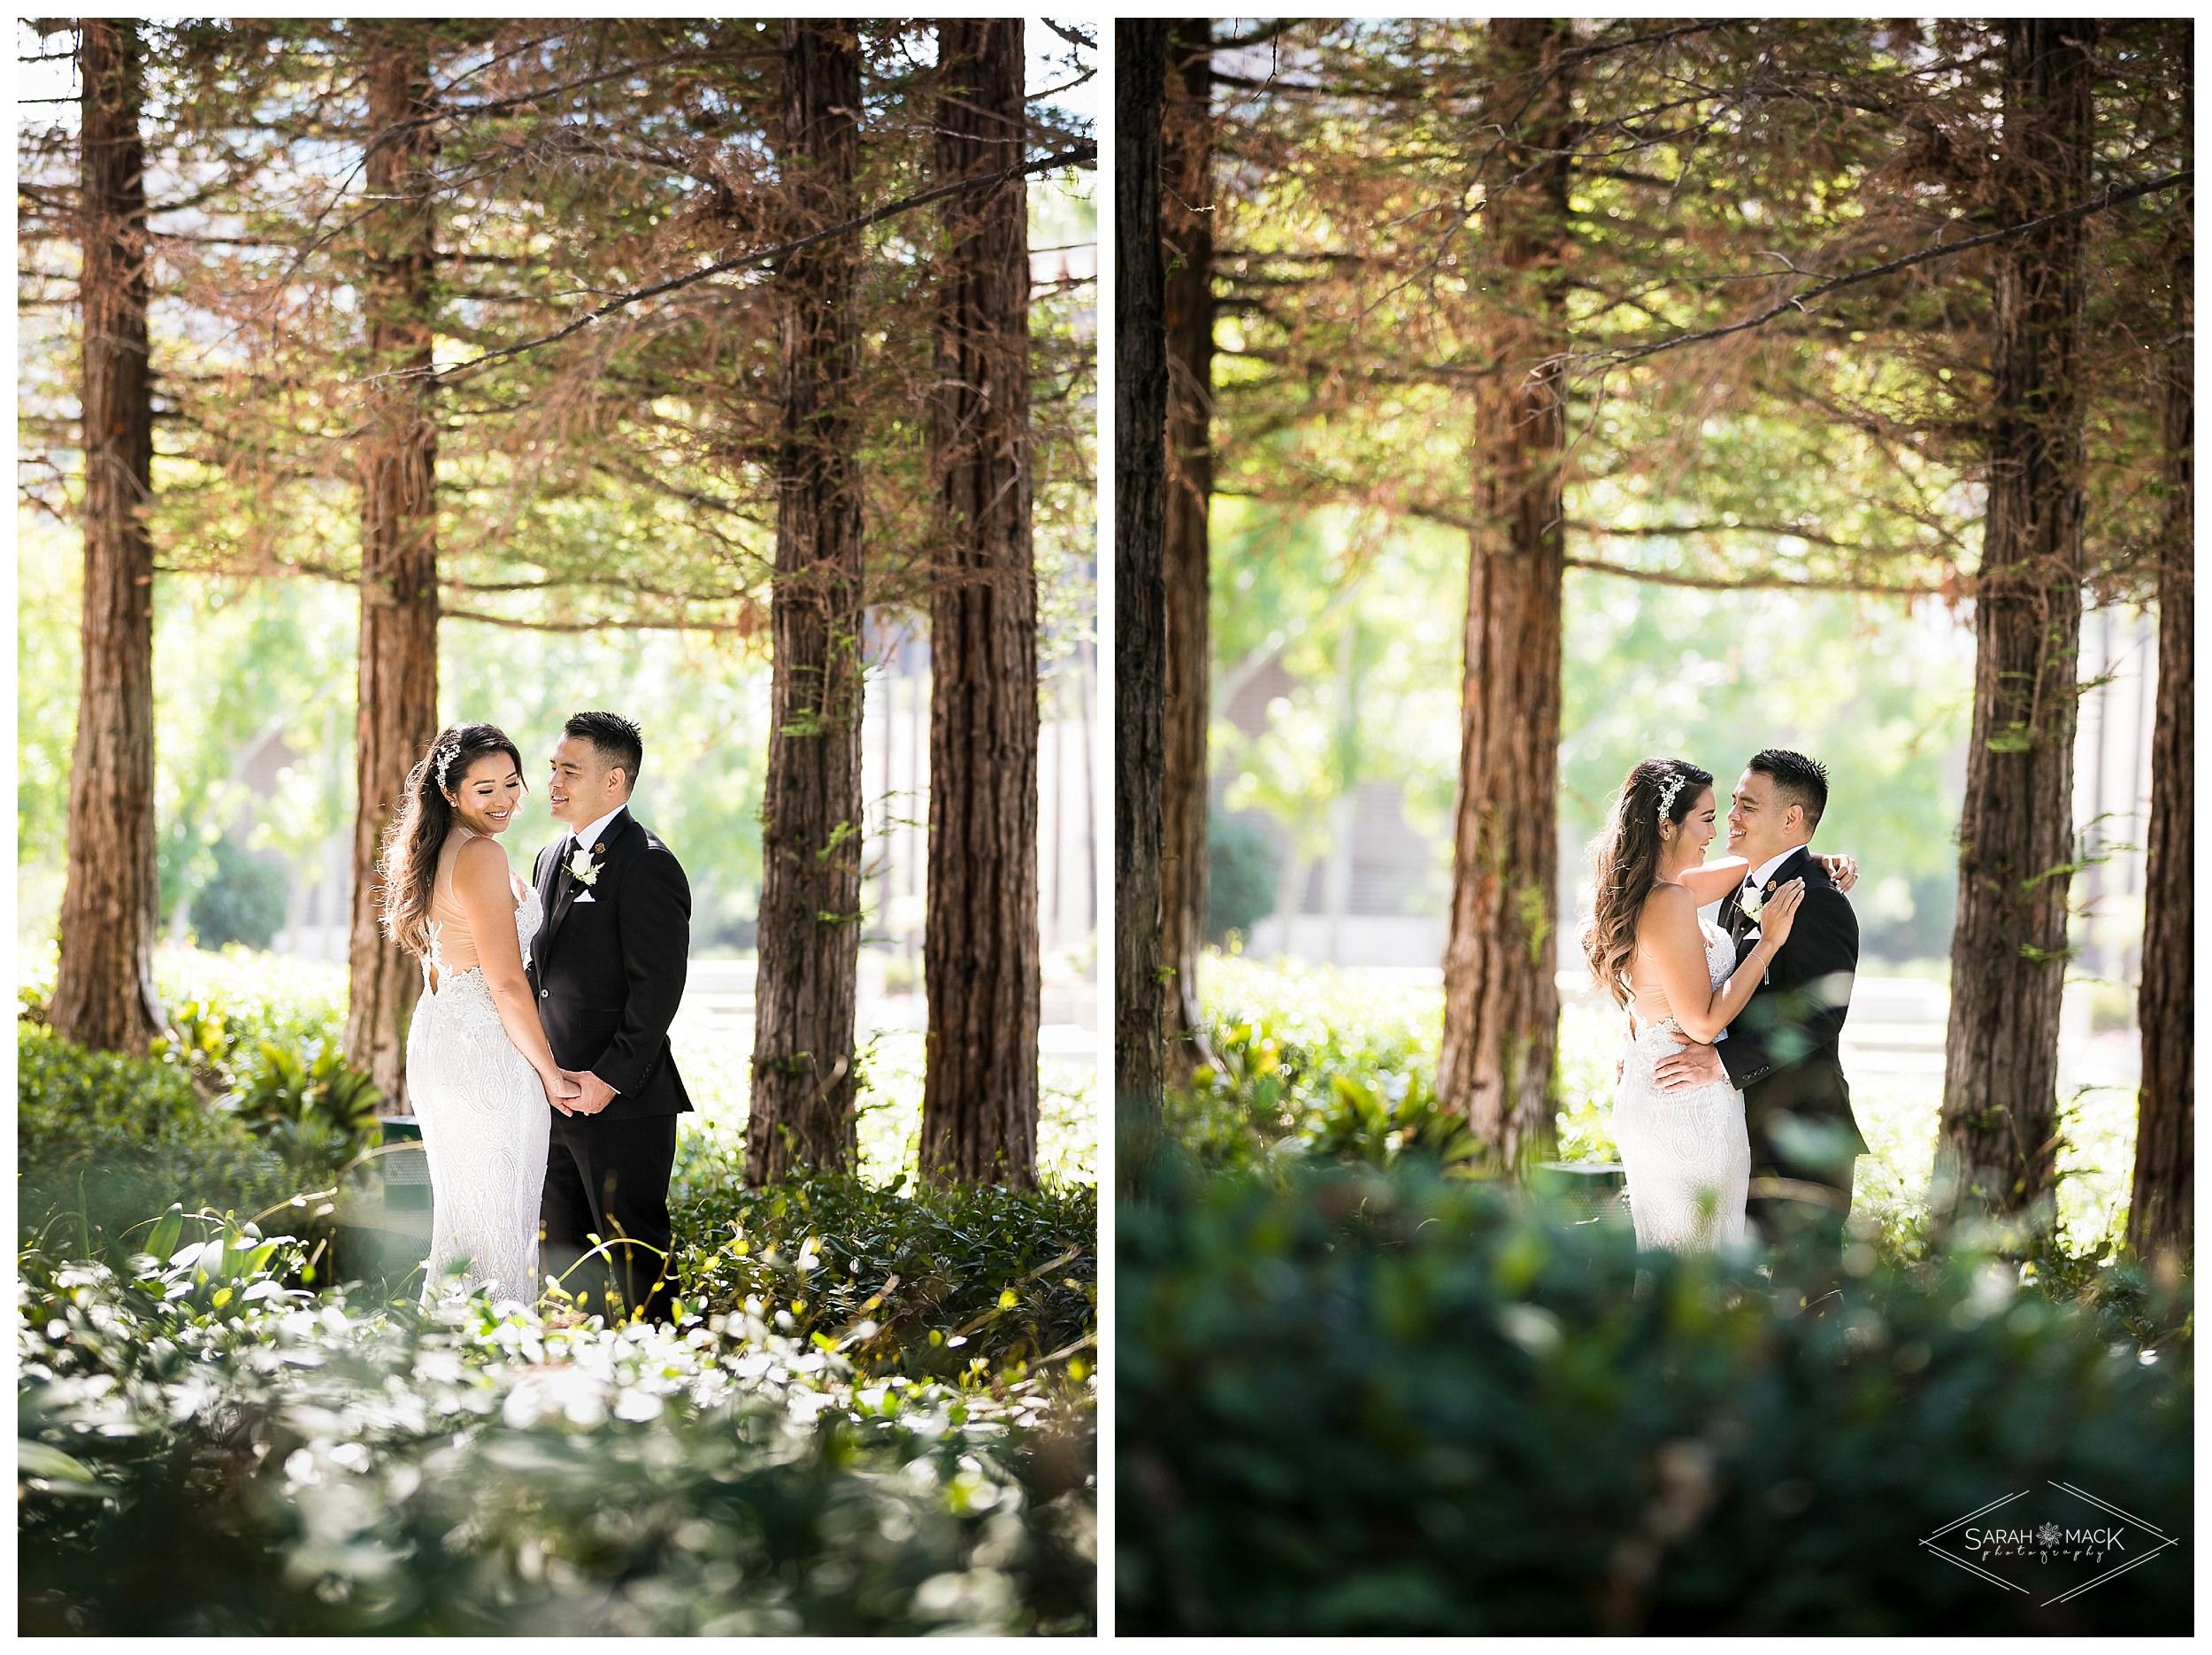 LE-Avenue-of-the-Arts-Costa-Mesa-Wedding-Photography-0080.jpg